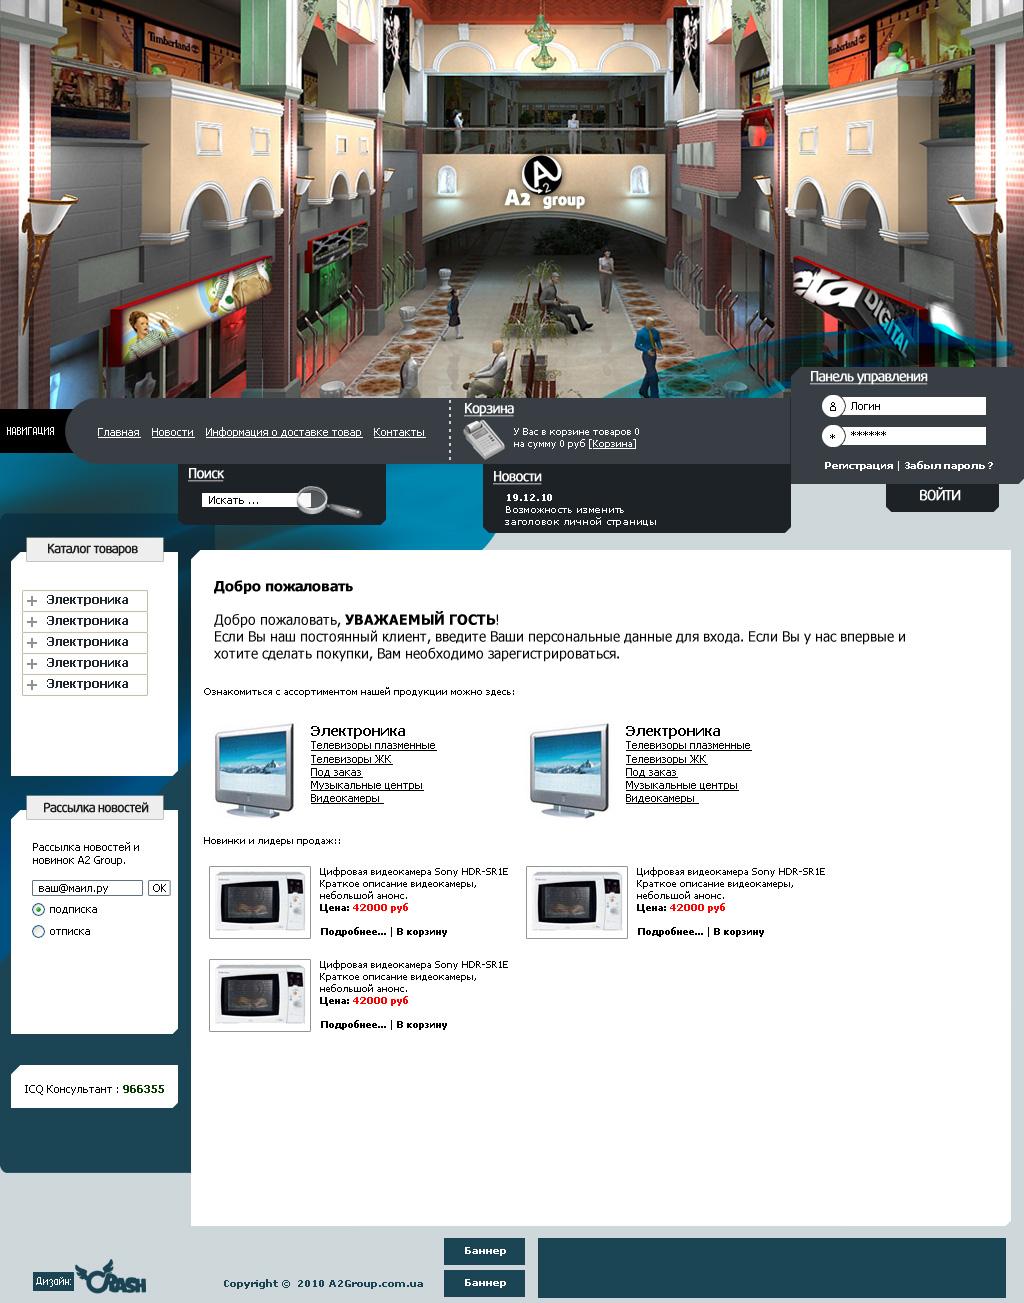 Разработка интернет-магазина «A2 group»